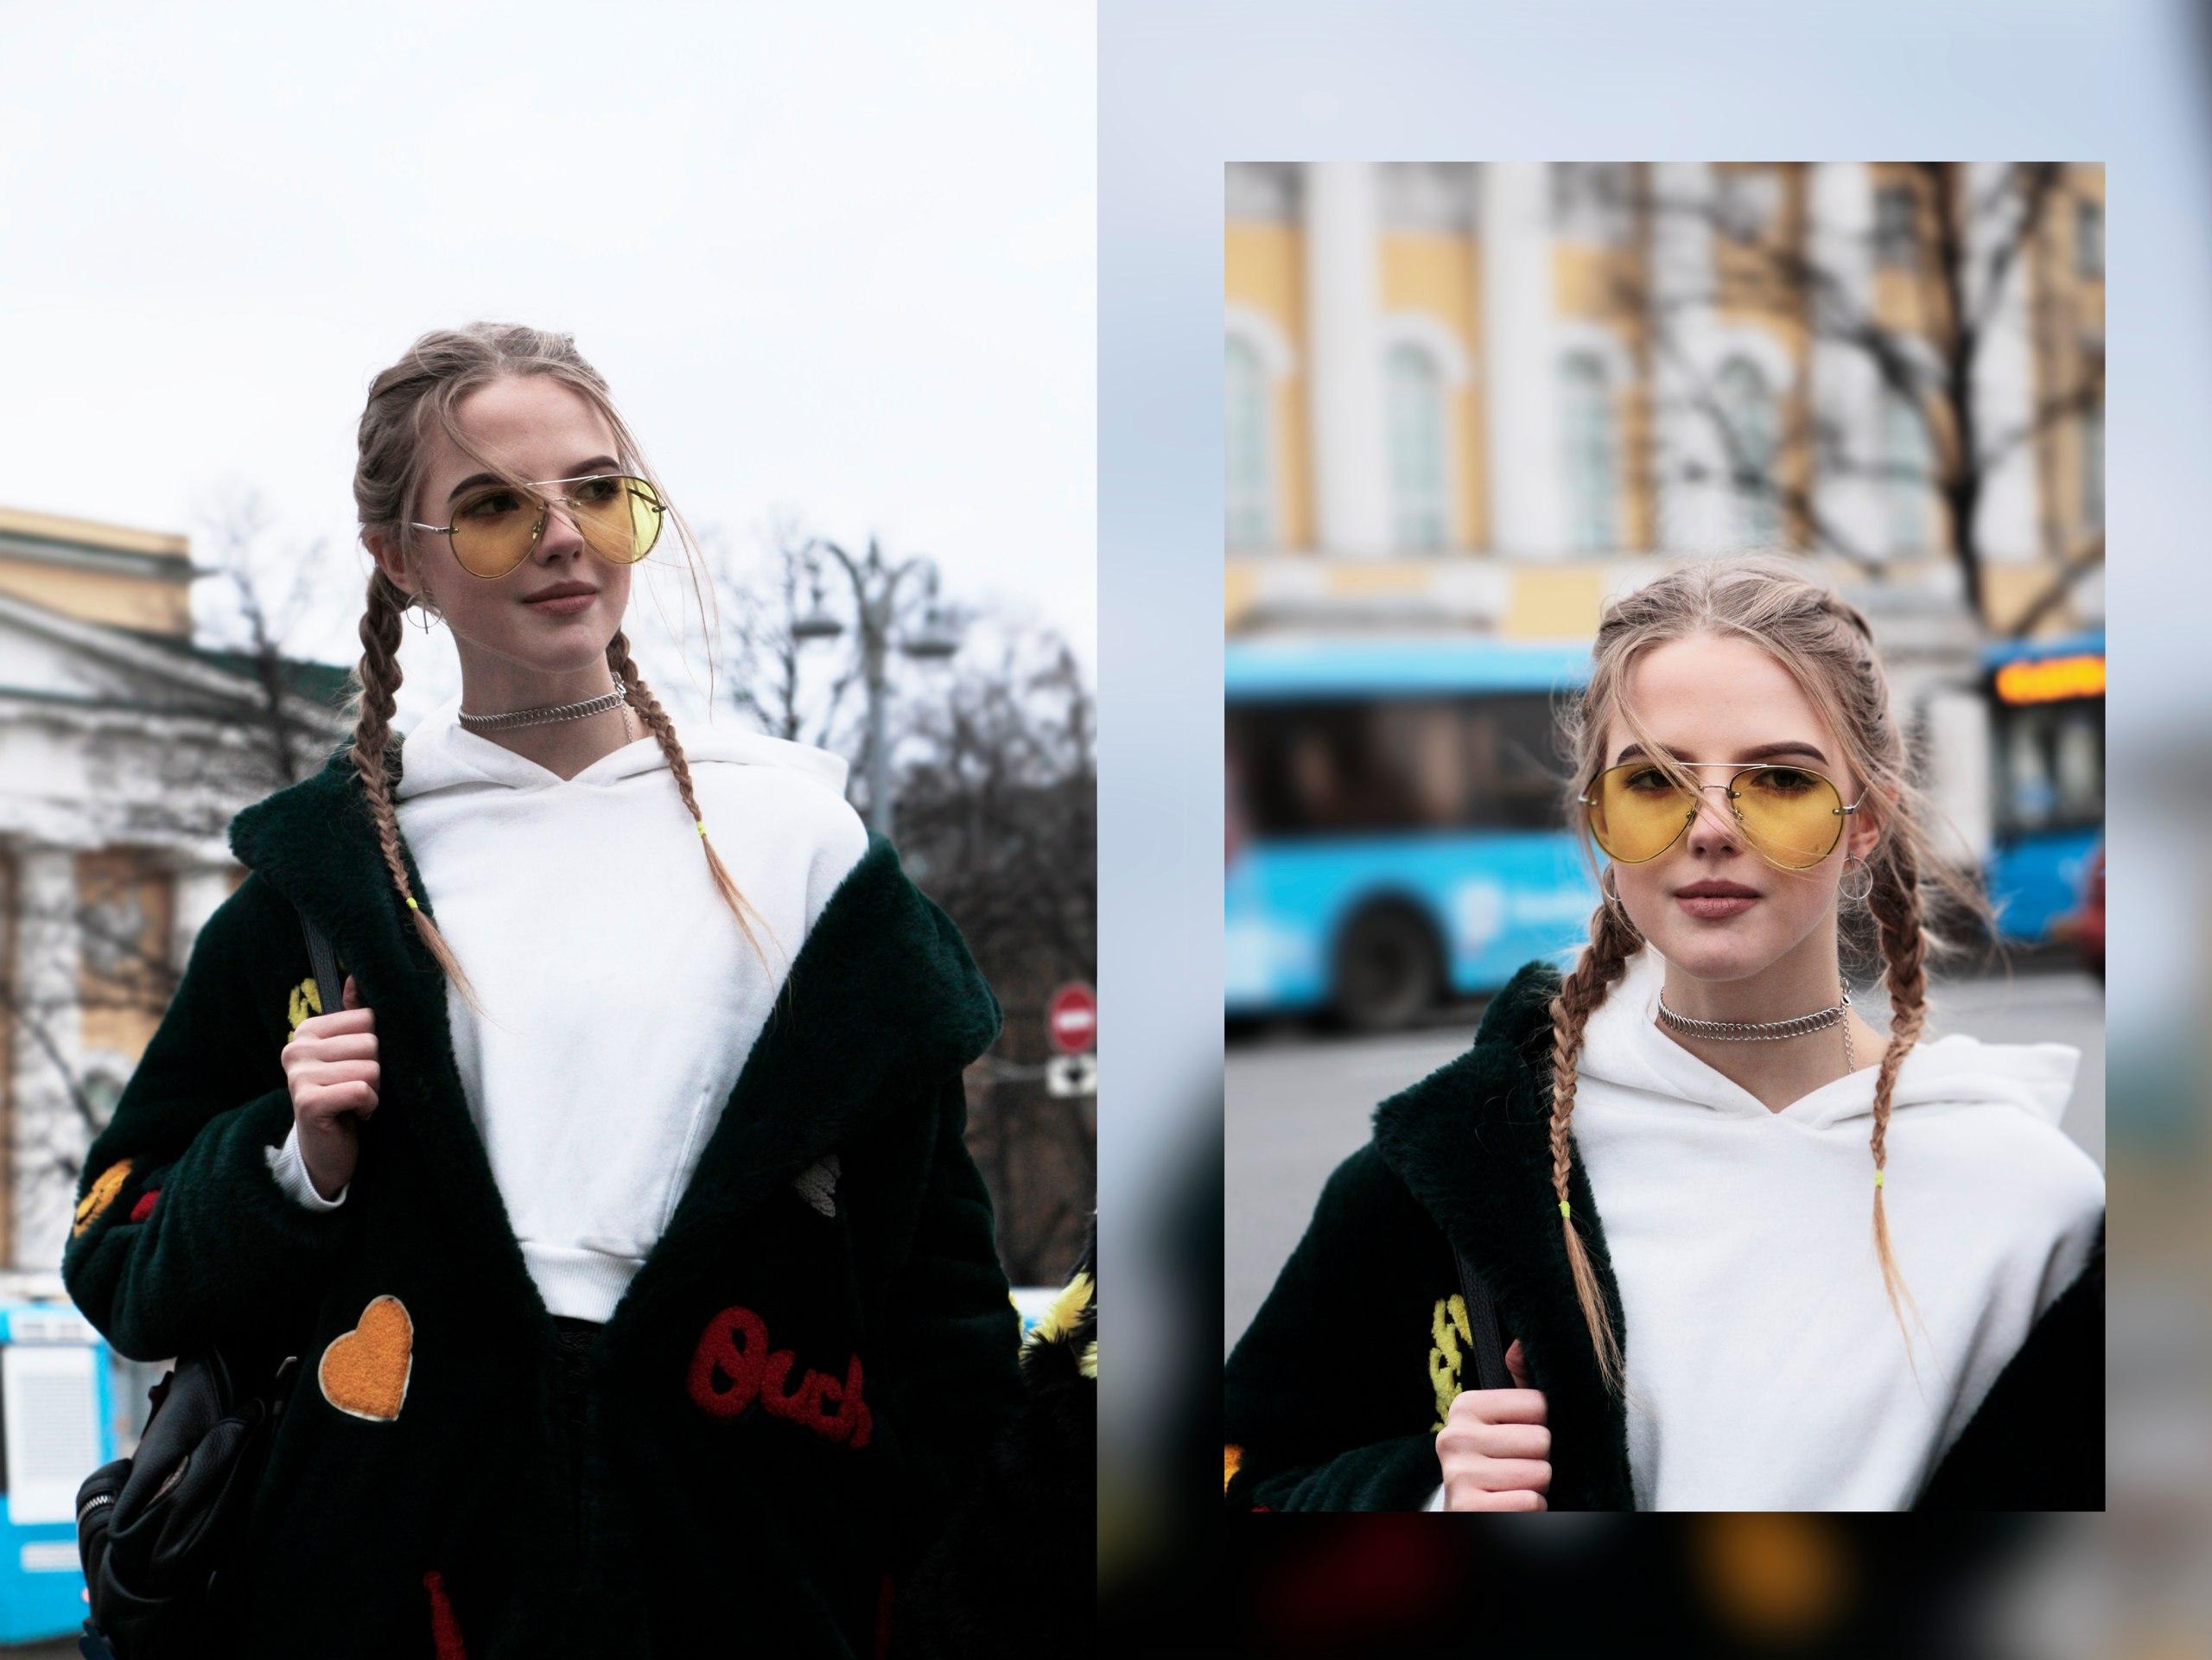 Street fashion blogger